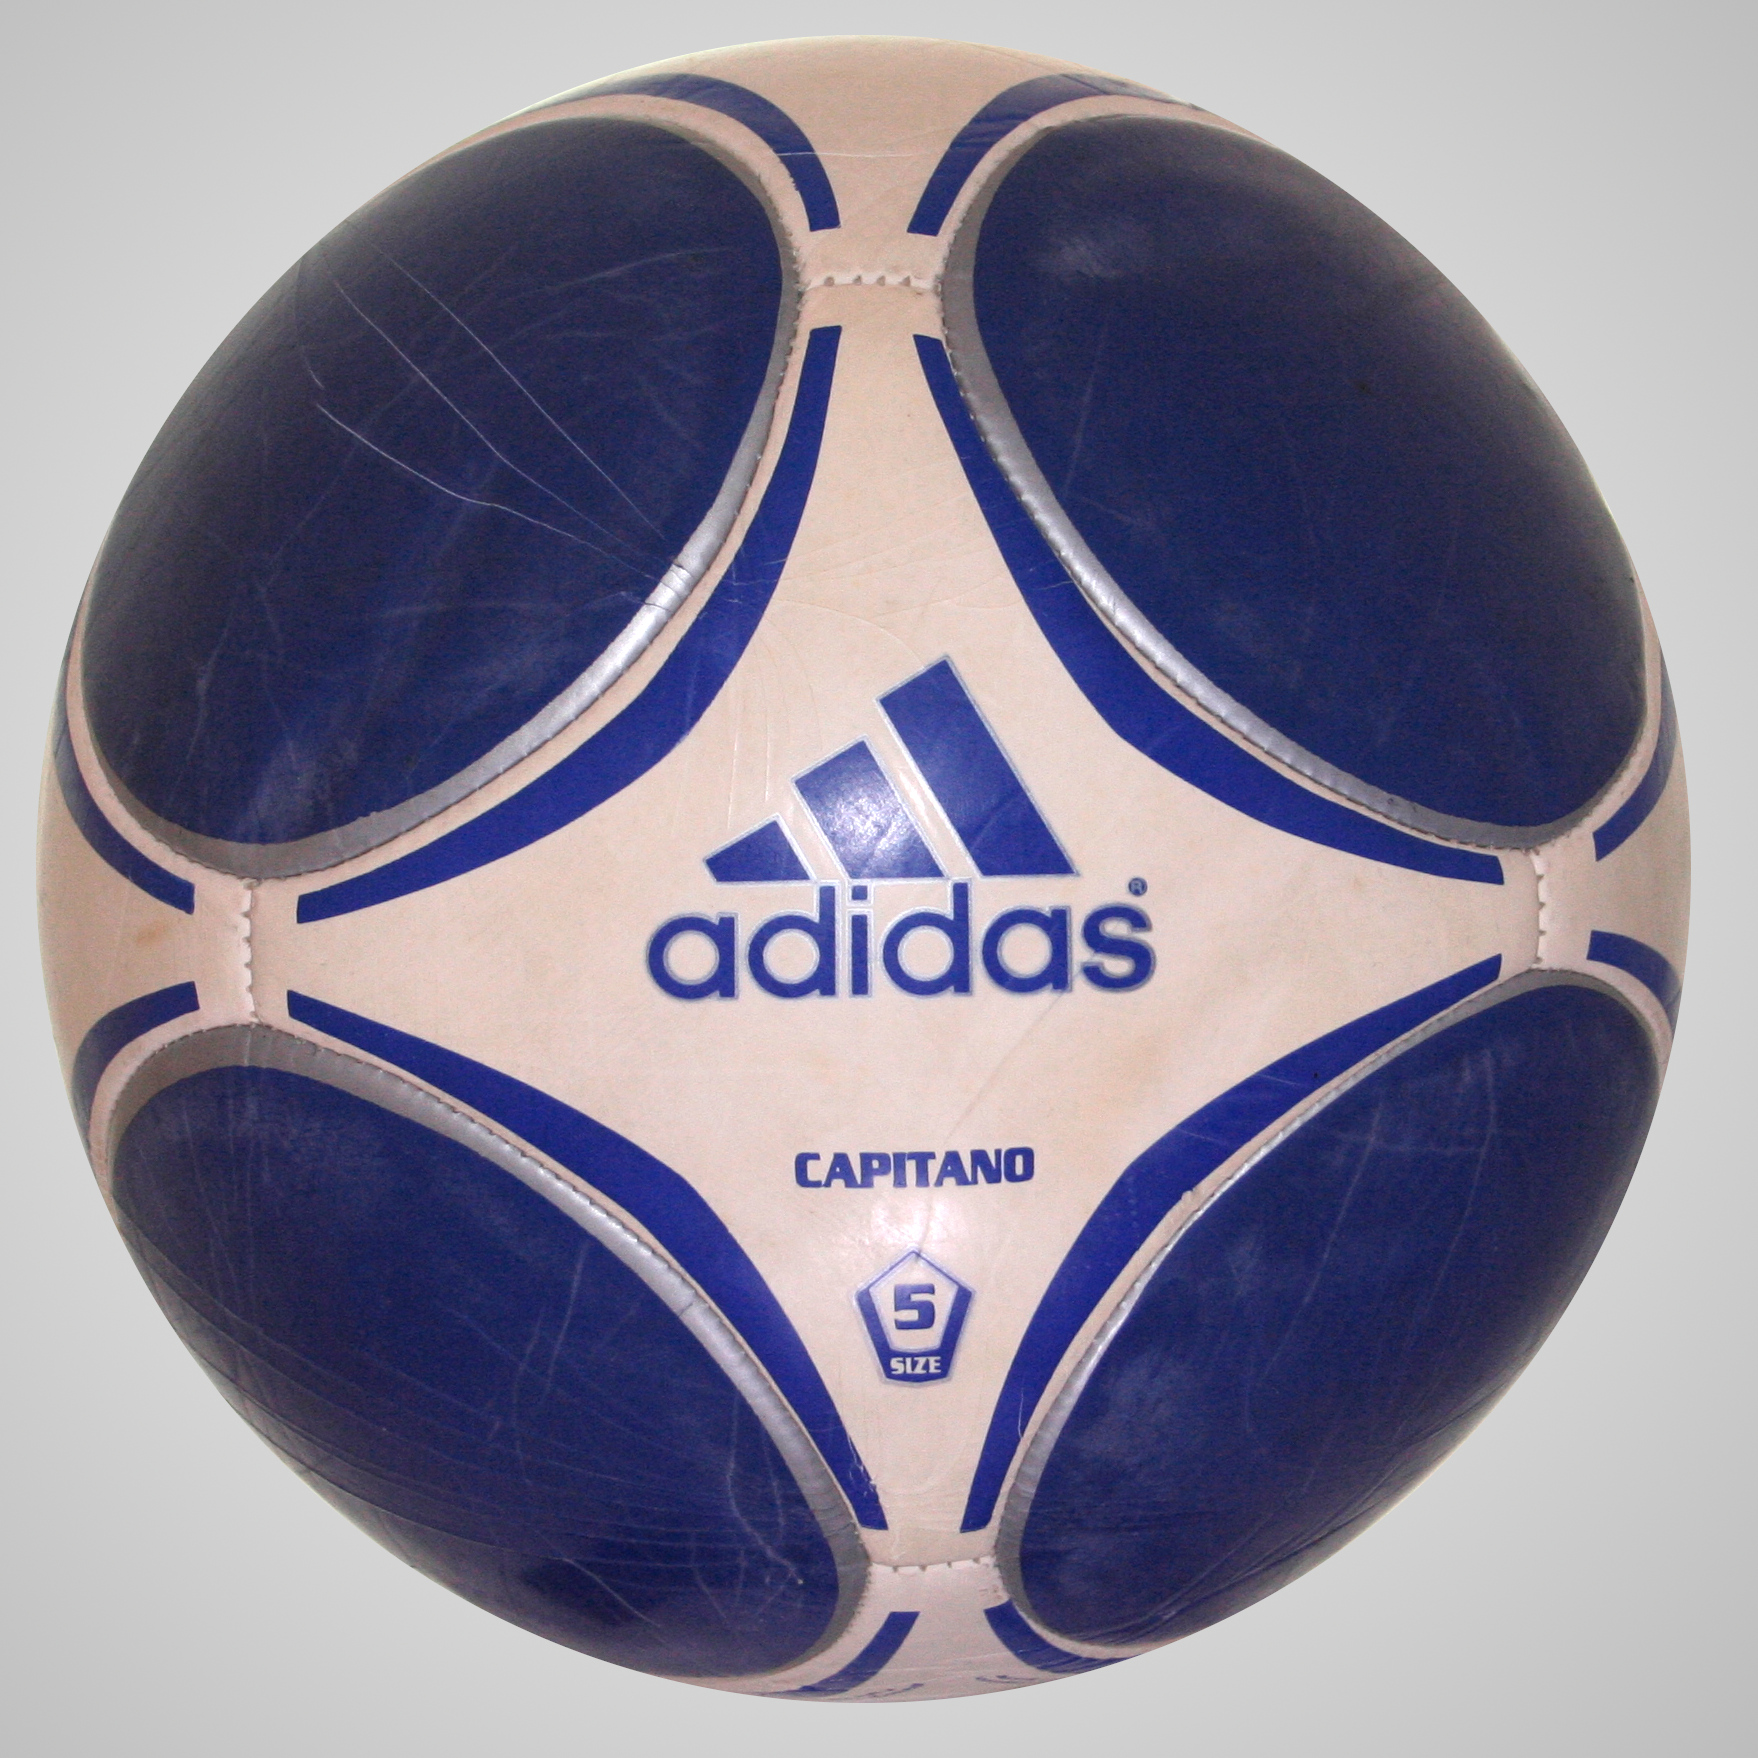 Adidas Schalke Capitano